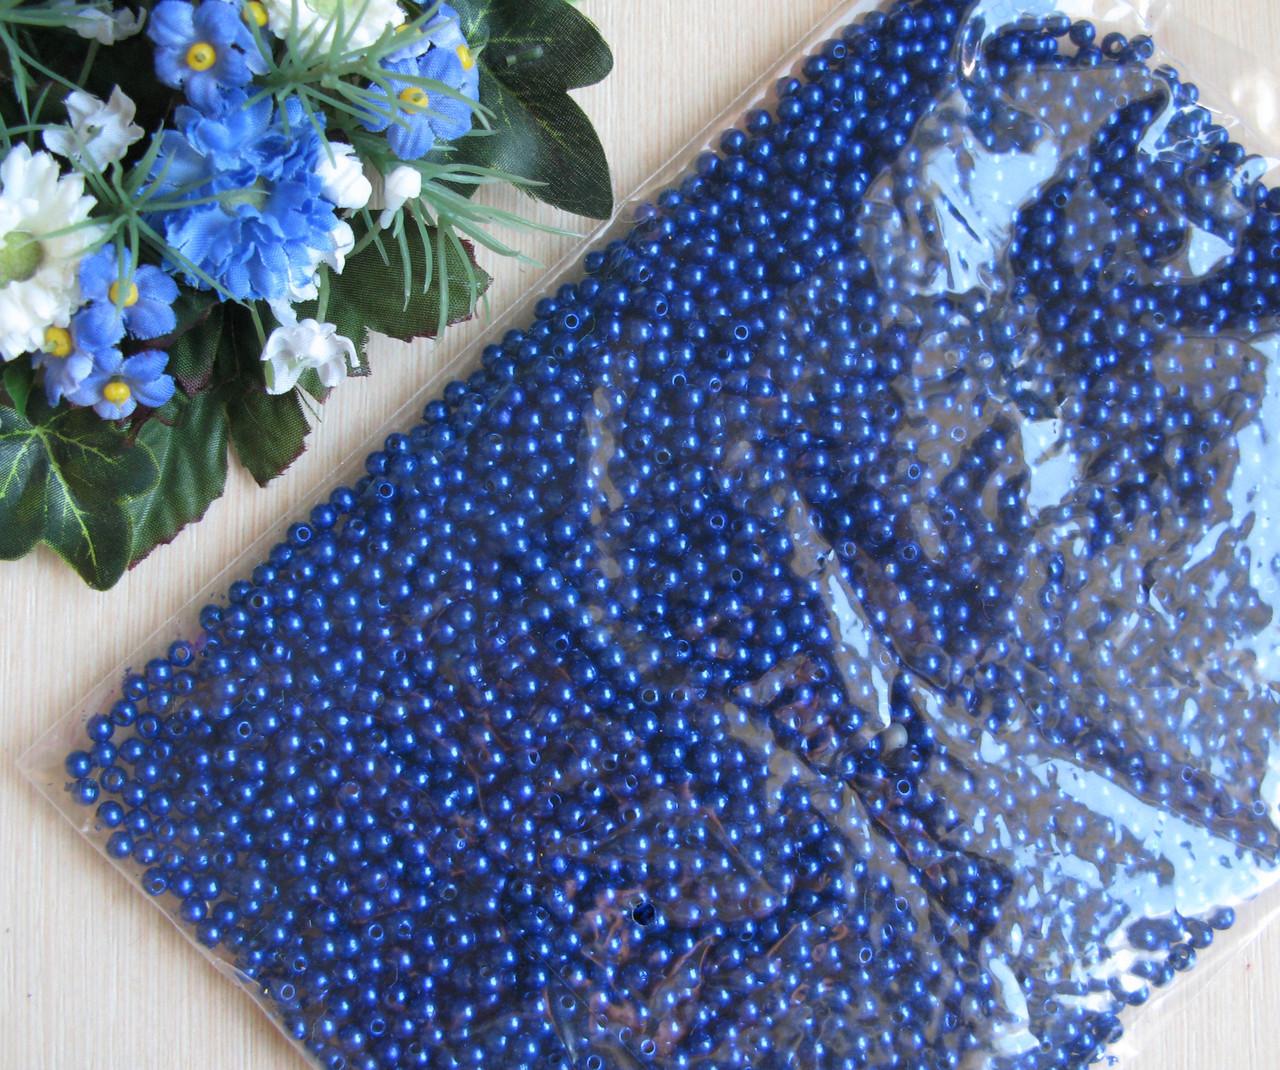 Жемчуг синий диаметр 0,4 см Вес упаковки 100 гр около 3500 шт